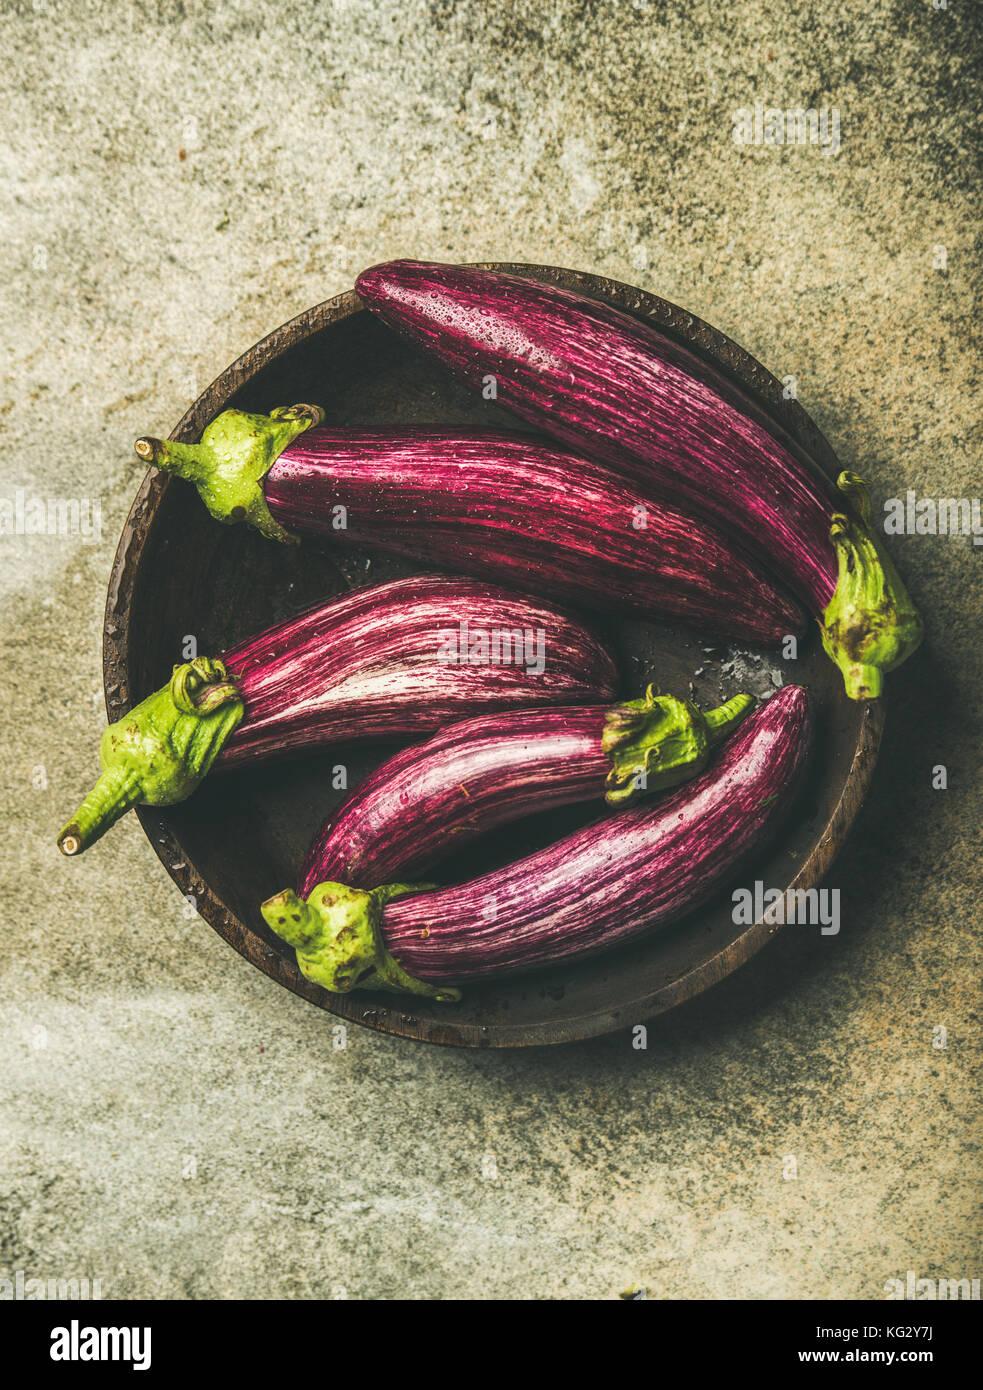 Flat-lay of fresh raw Fall harvest purple eggplants or aubergines - Stock Image